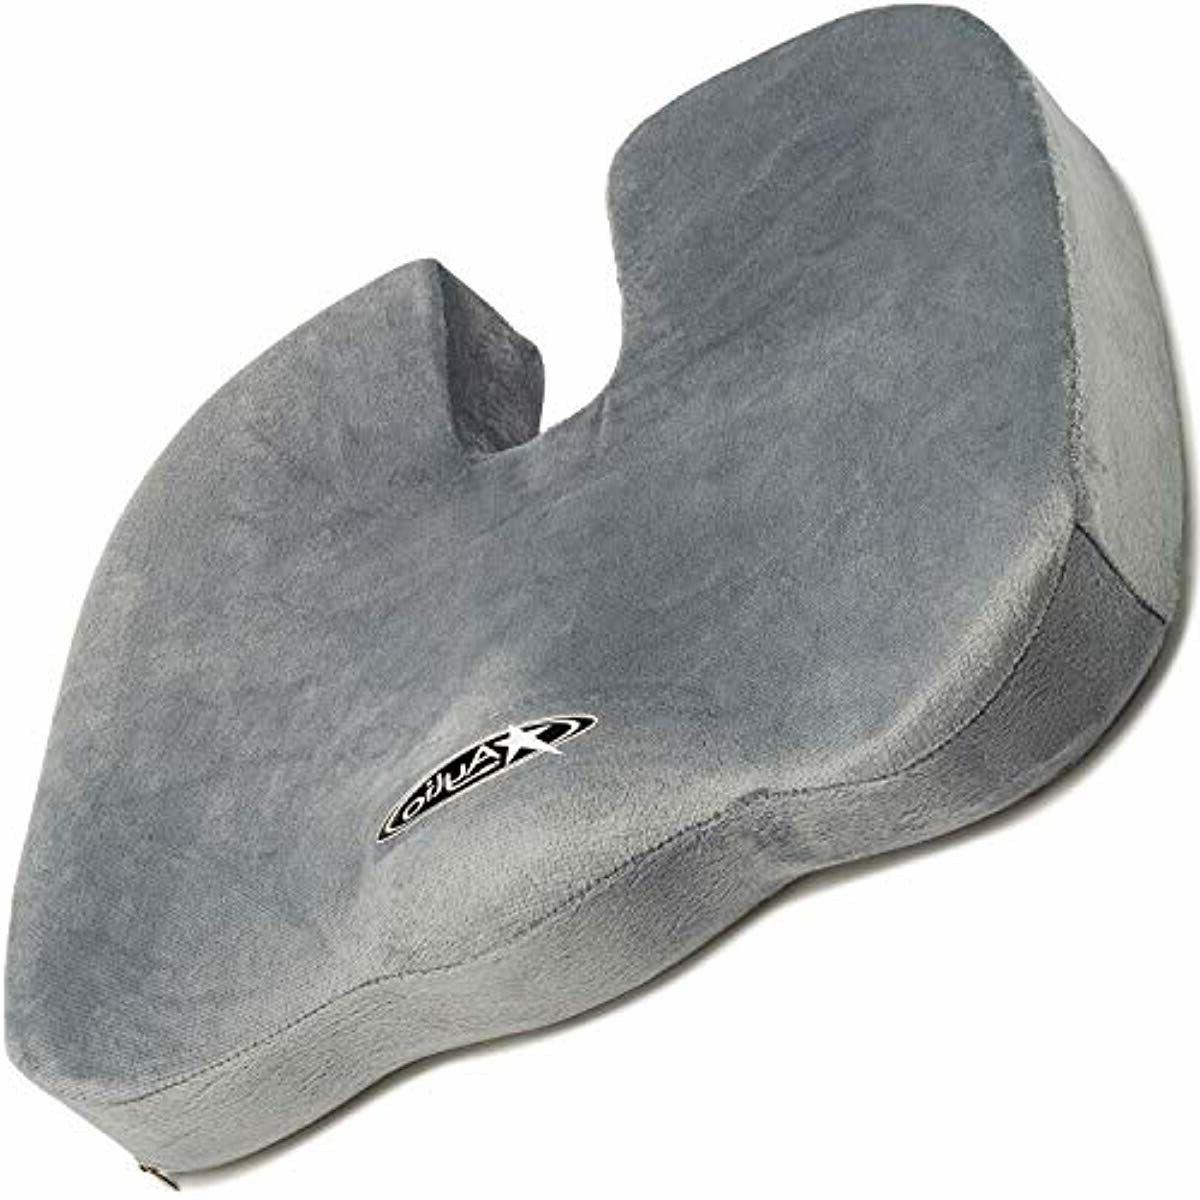 Aylio Extra Comfort Seat Cushion - Tailbone, Coccyx, Sciatic